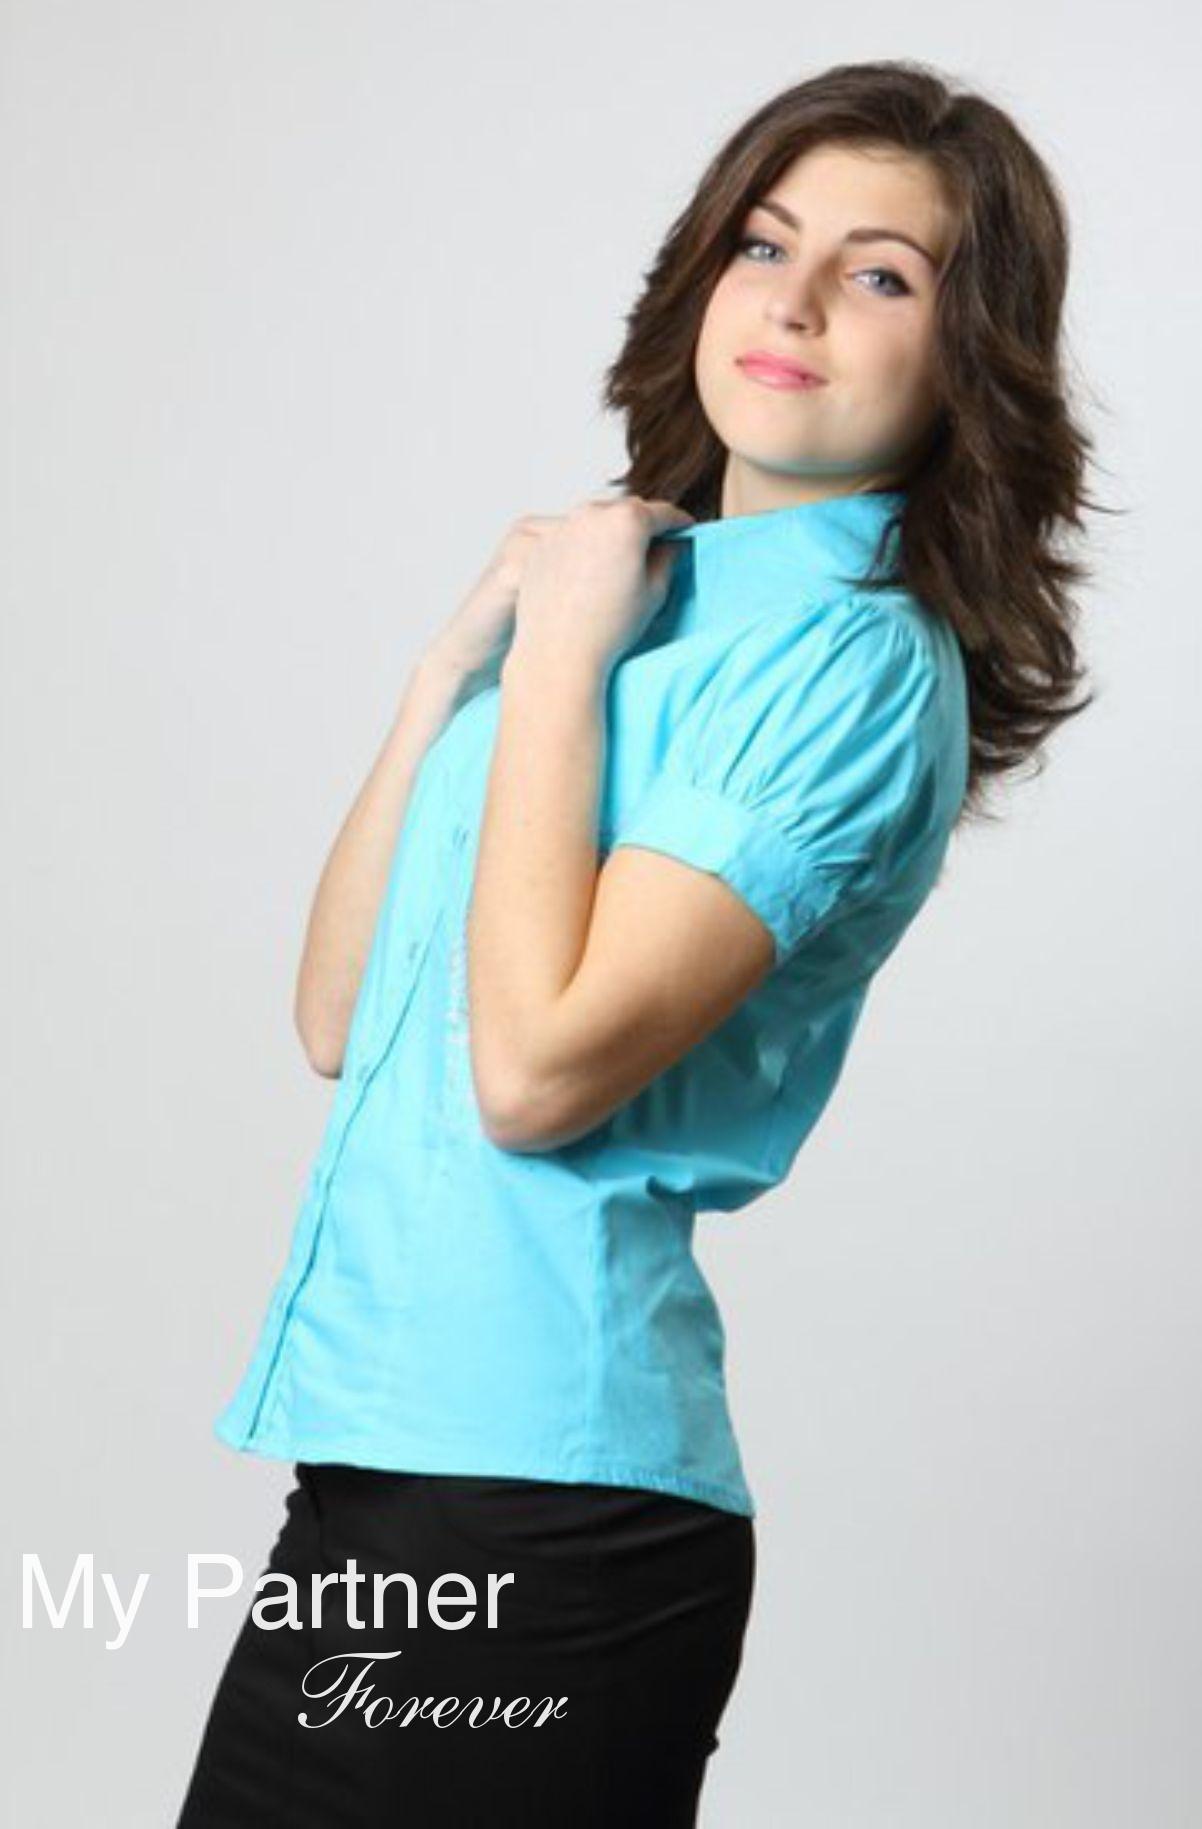 Dating Service to Meet Single Ukrainian Woman Elena from Vinnitsa, Ukraine